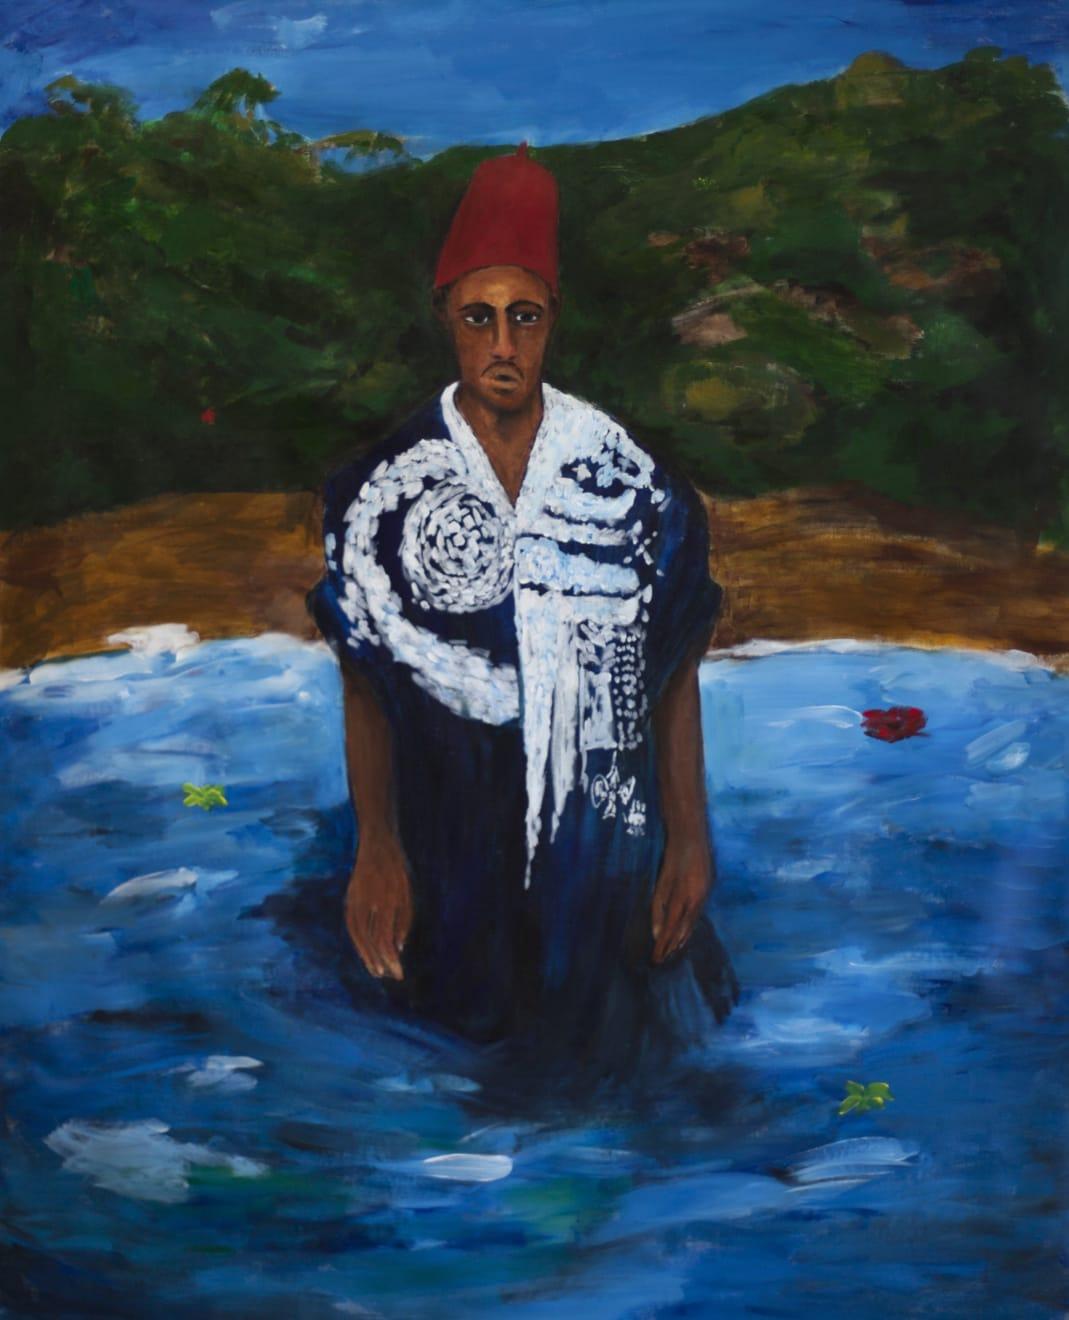 Anuar Khalifi, MAWQIF, 2020, Acrylic on canvas, 145 x 114cm